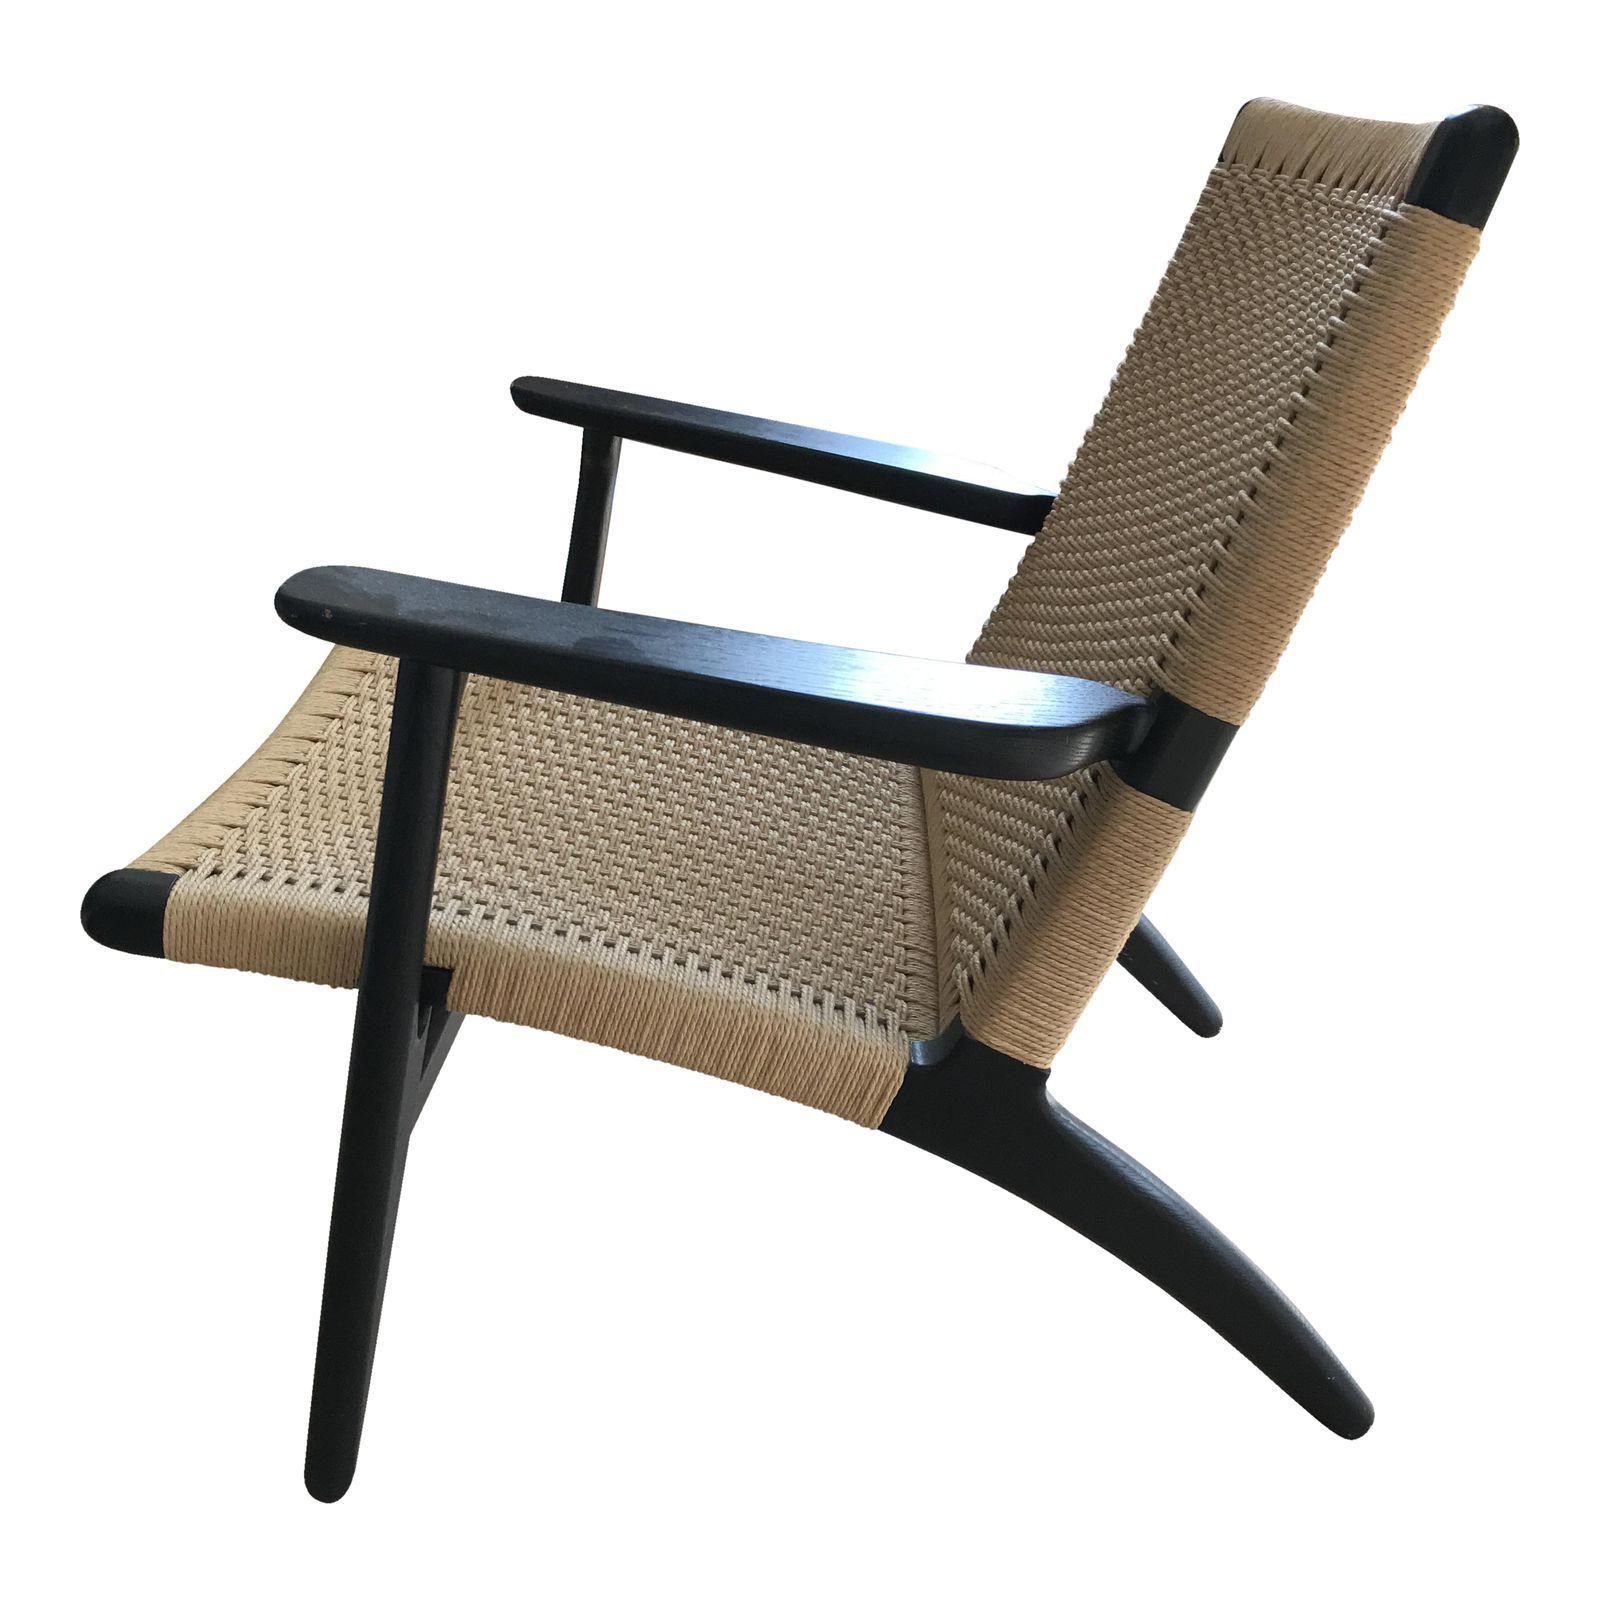 Hans Wegner CH25 Easy Chair Image 1 of 4